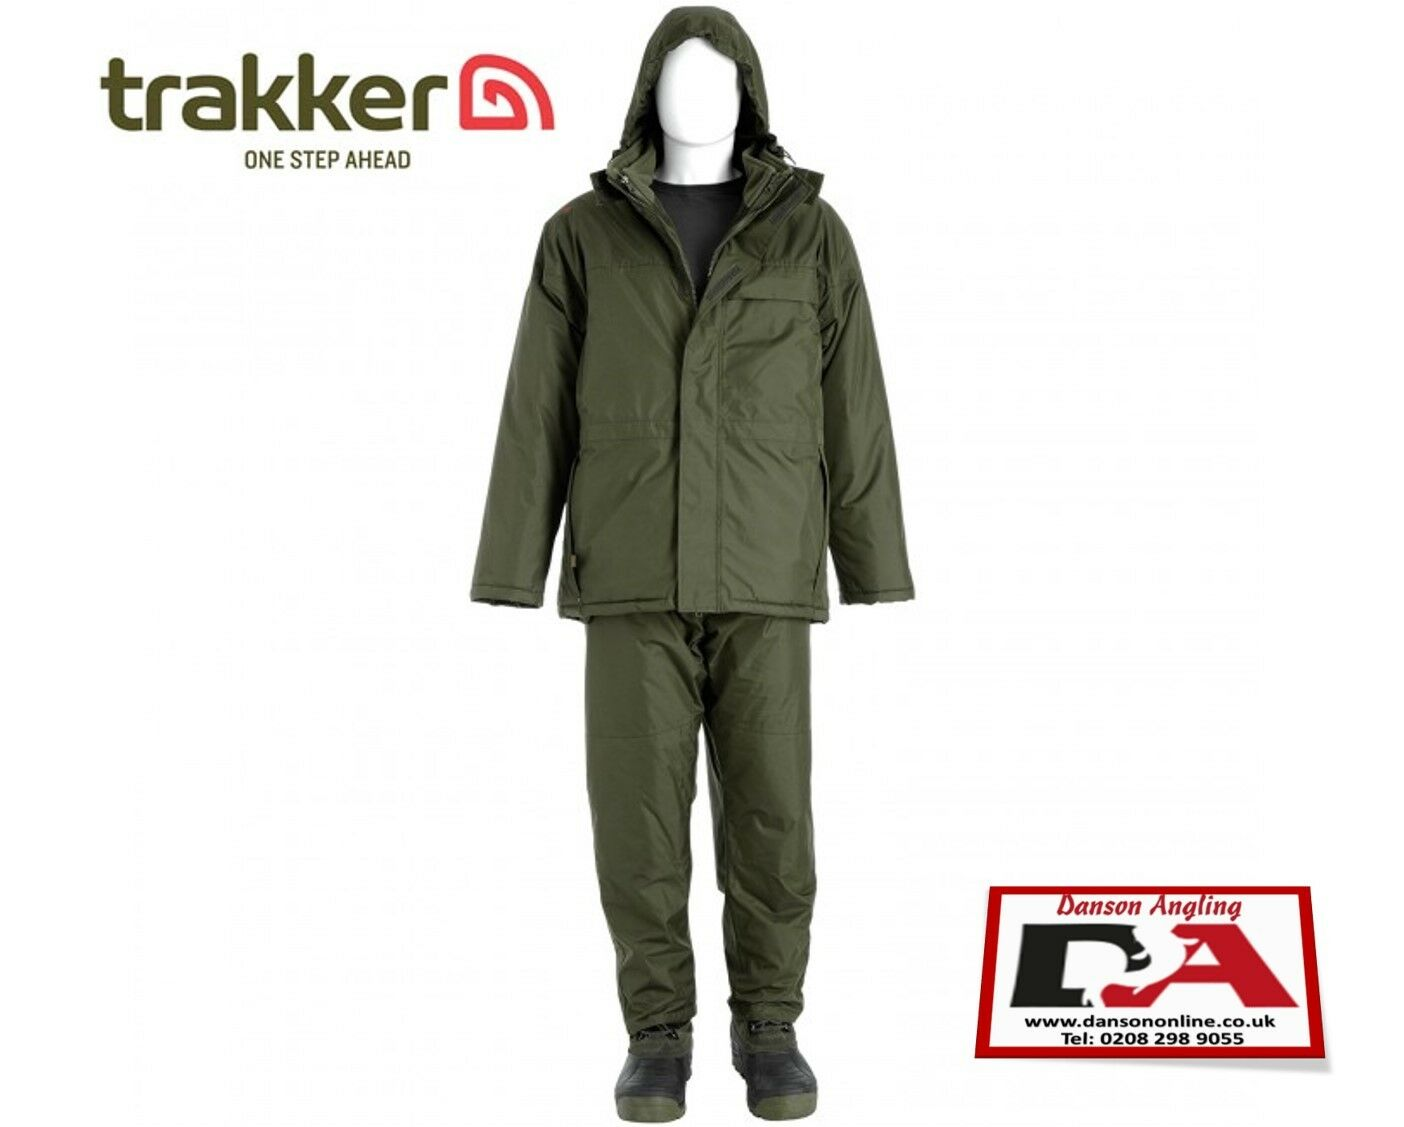 Trakker F-32 Combi-Suit XXL MEGA DEAL NEW Carp Fishing Winter Suit